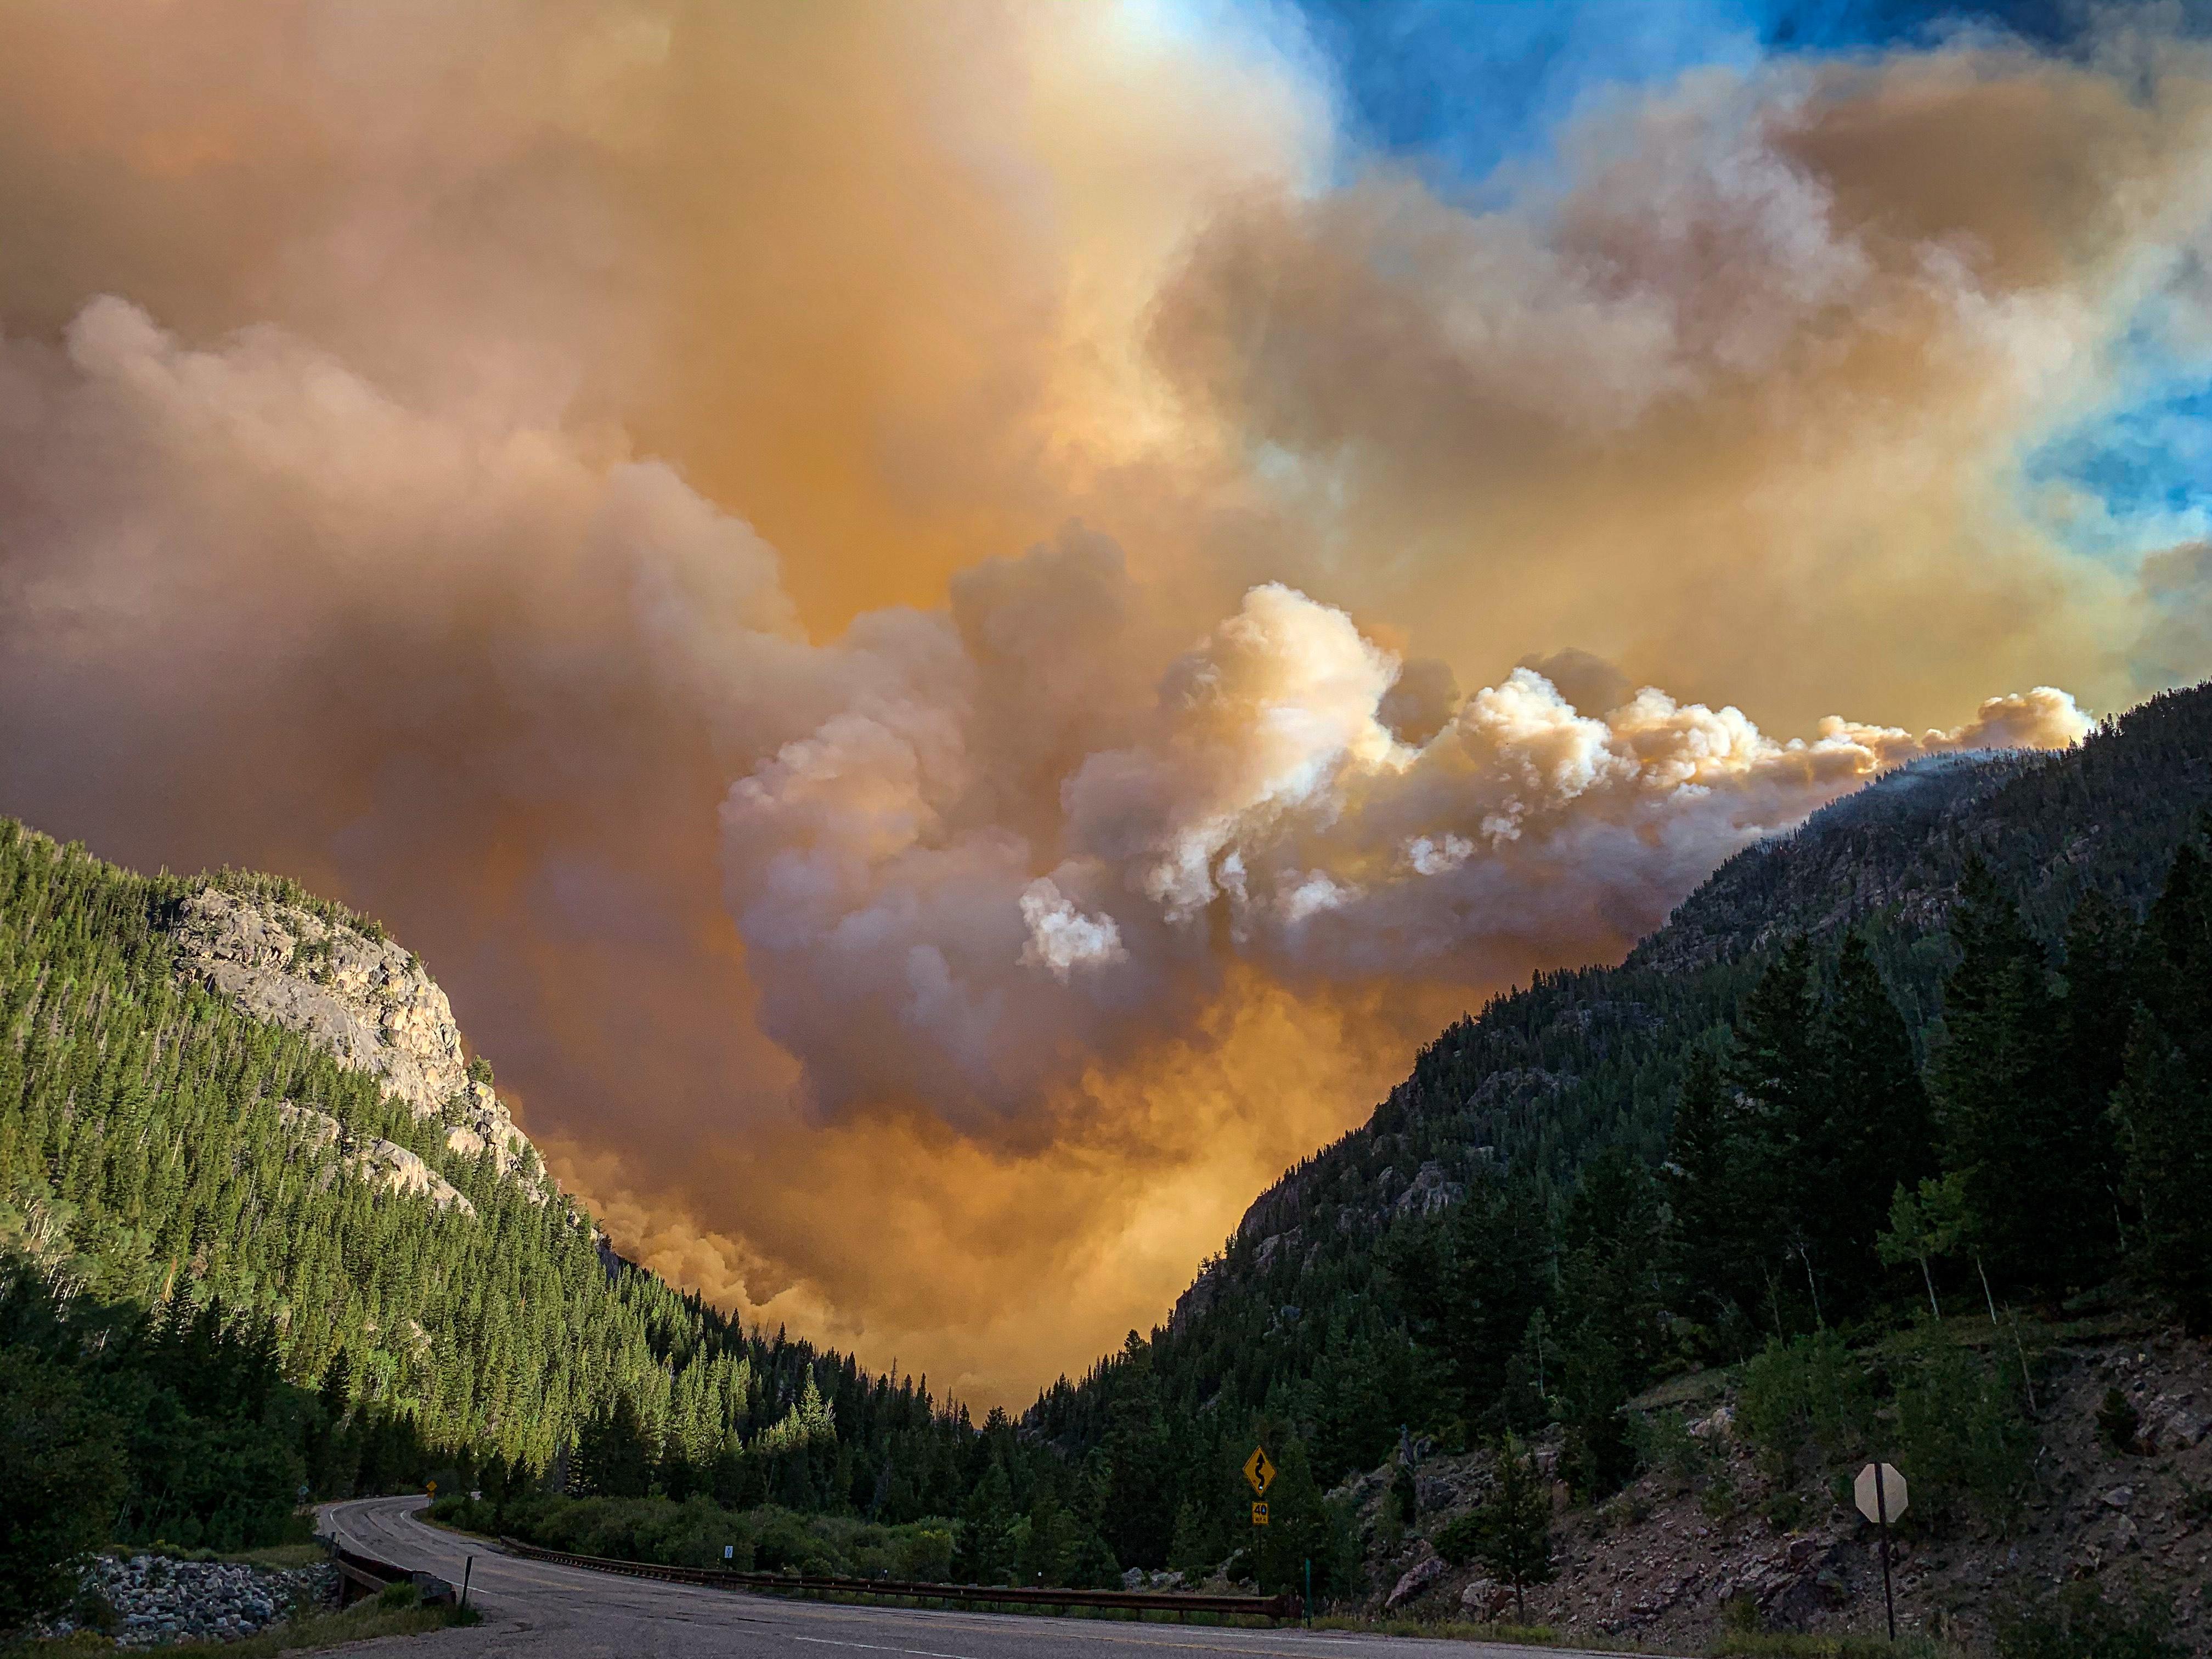 cameron peak fire - photo #21